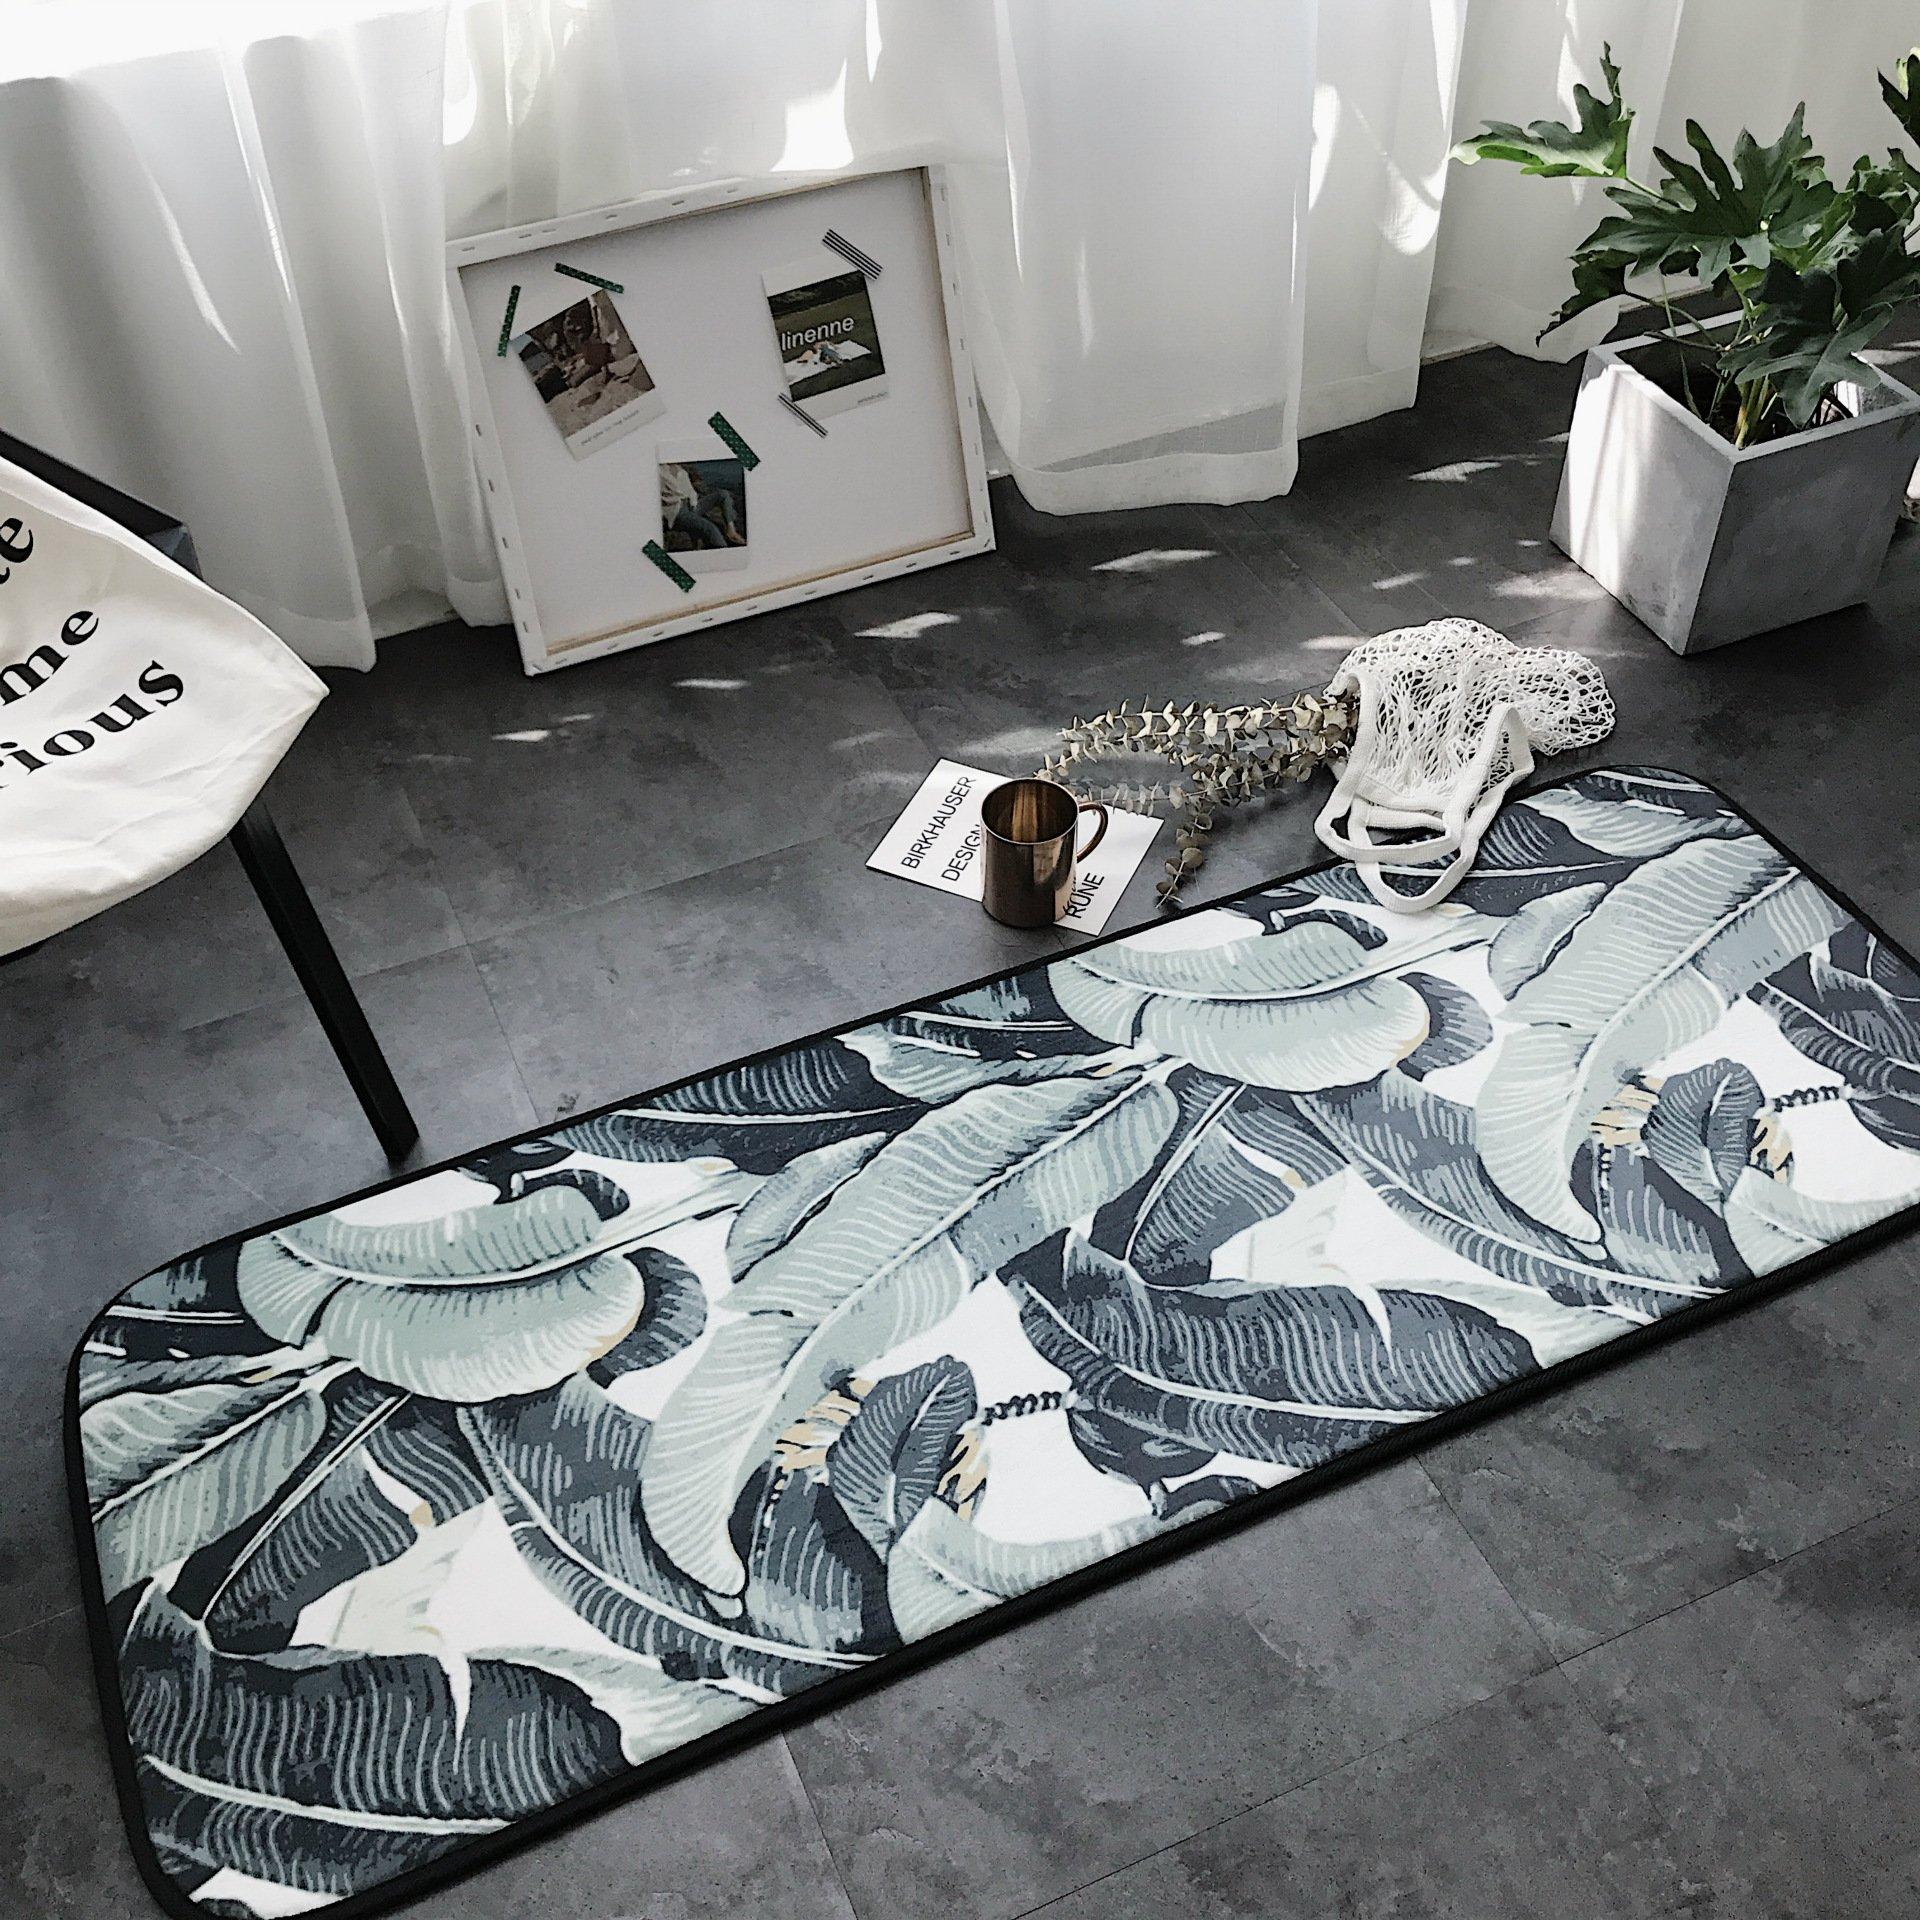 Tropical Leaves Decor Modern Wide Runner Area Rug - Anti-slip Microfiber Door Bathroom Bedside Mat For Home Dorm or Apartment Decor HRG01-US (Tropical leaves #1)